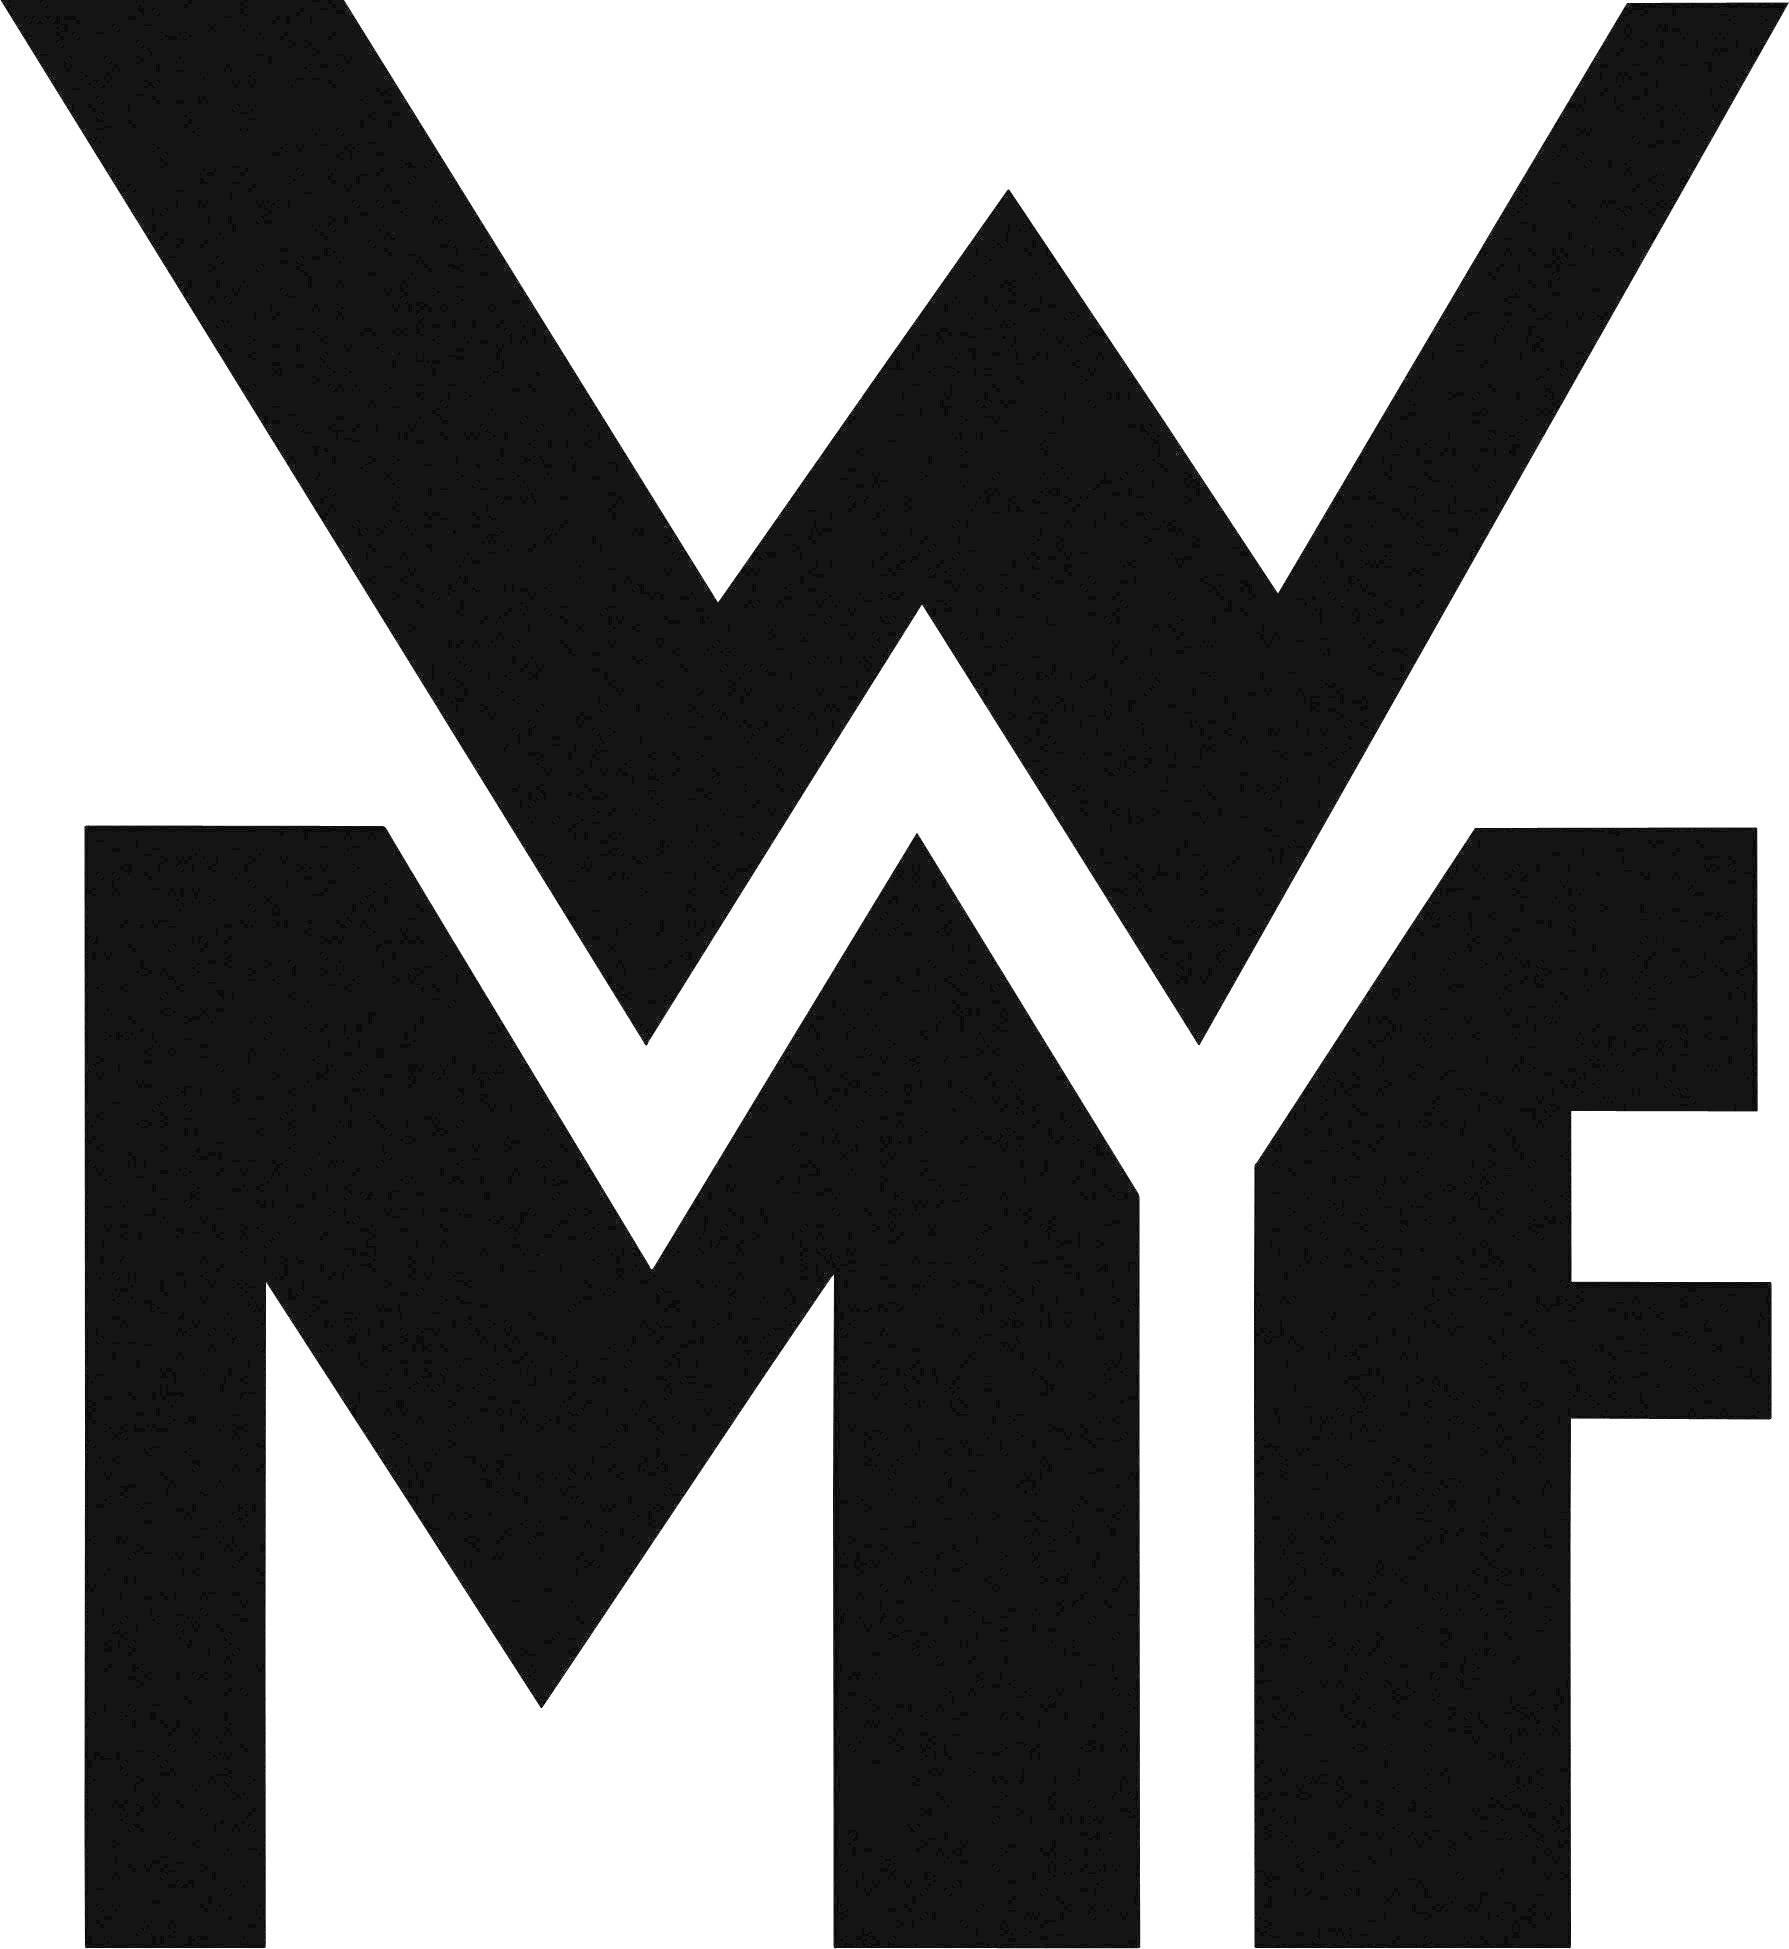 Kavni aparat WMF STELIO Aroma legirano jeklo, kapaciteta: 10 skodelic, funkcija ohranjanja toplote